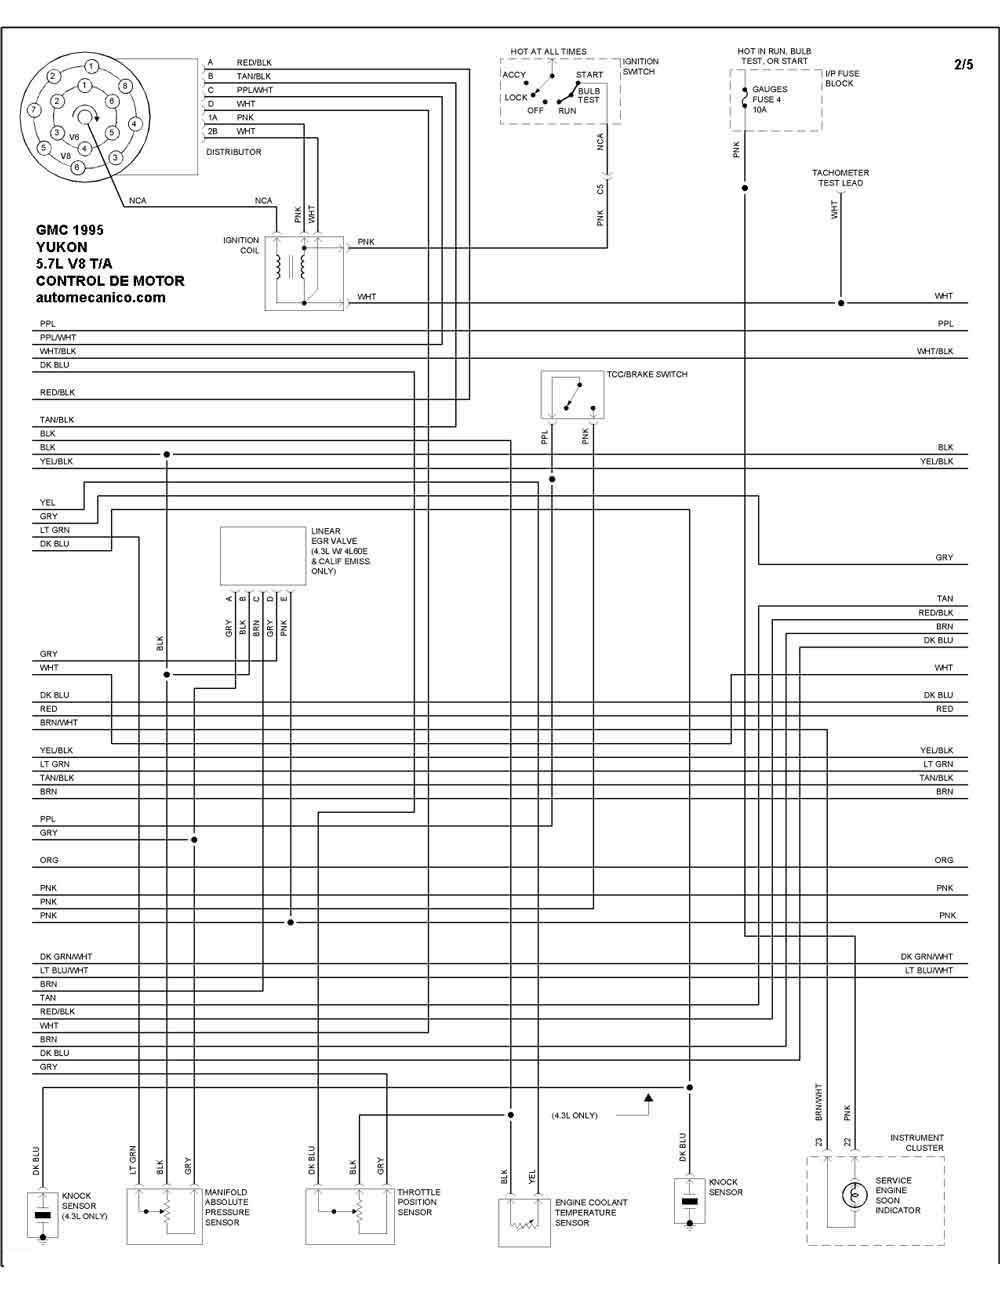 2005 gmc yukon Diagrama del motors